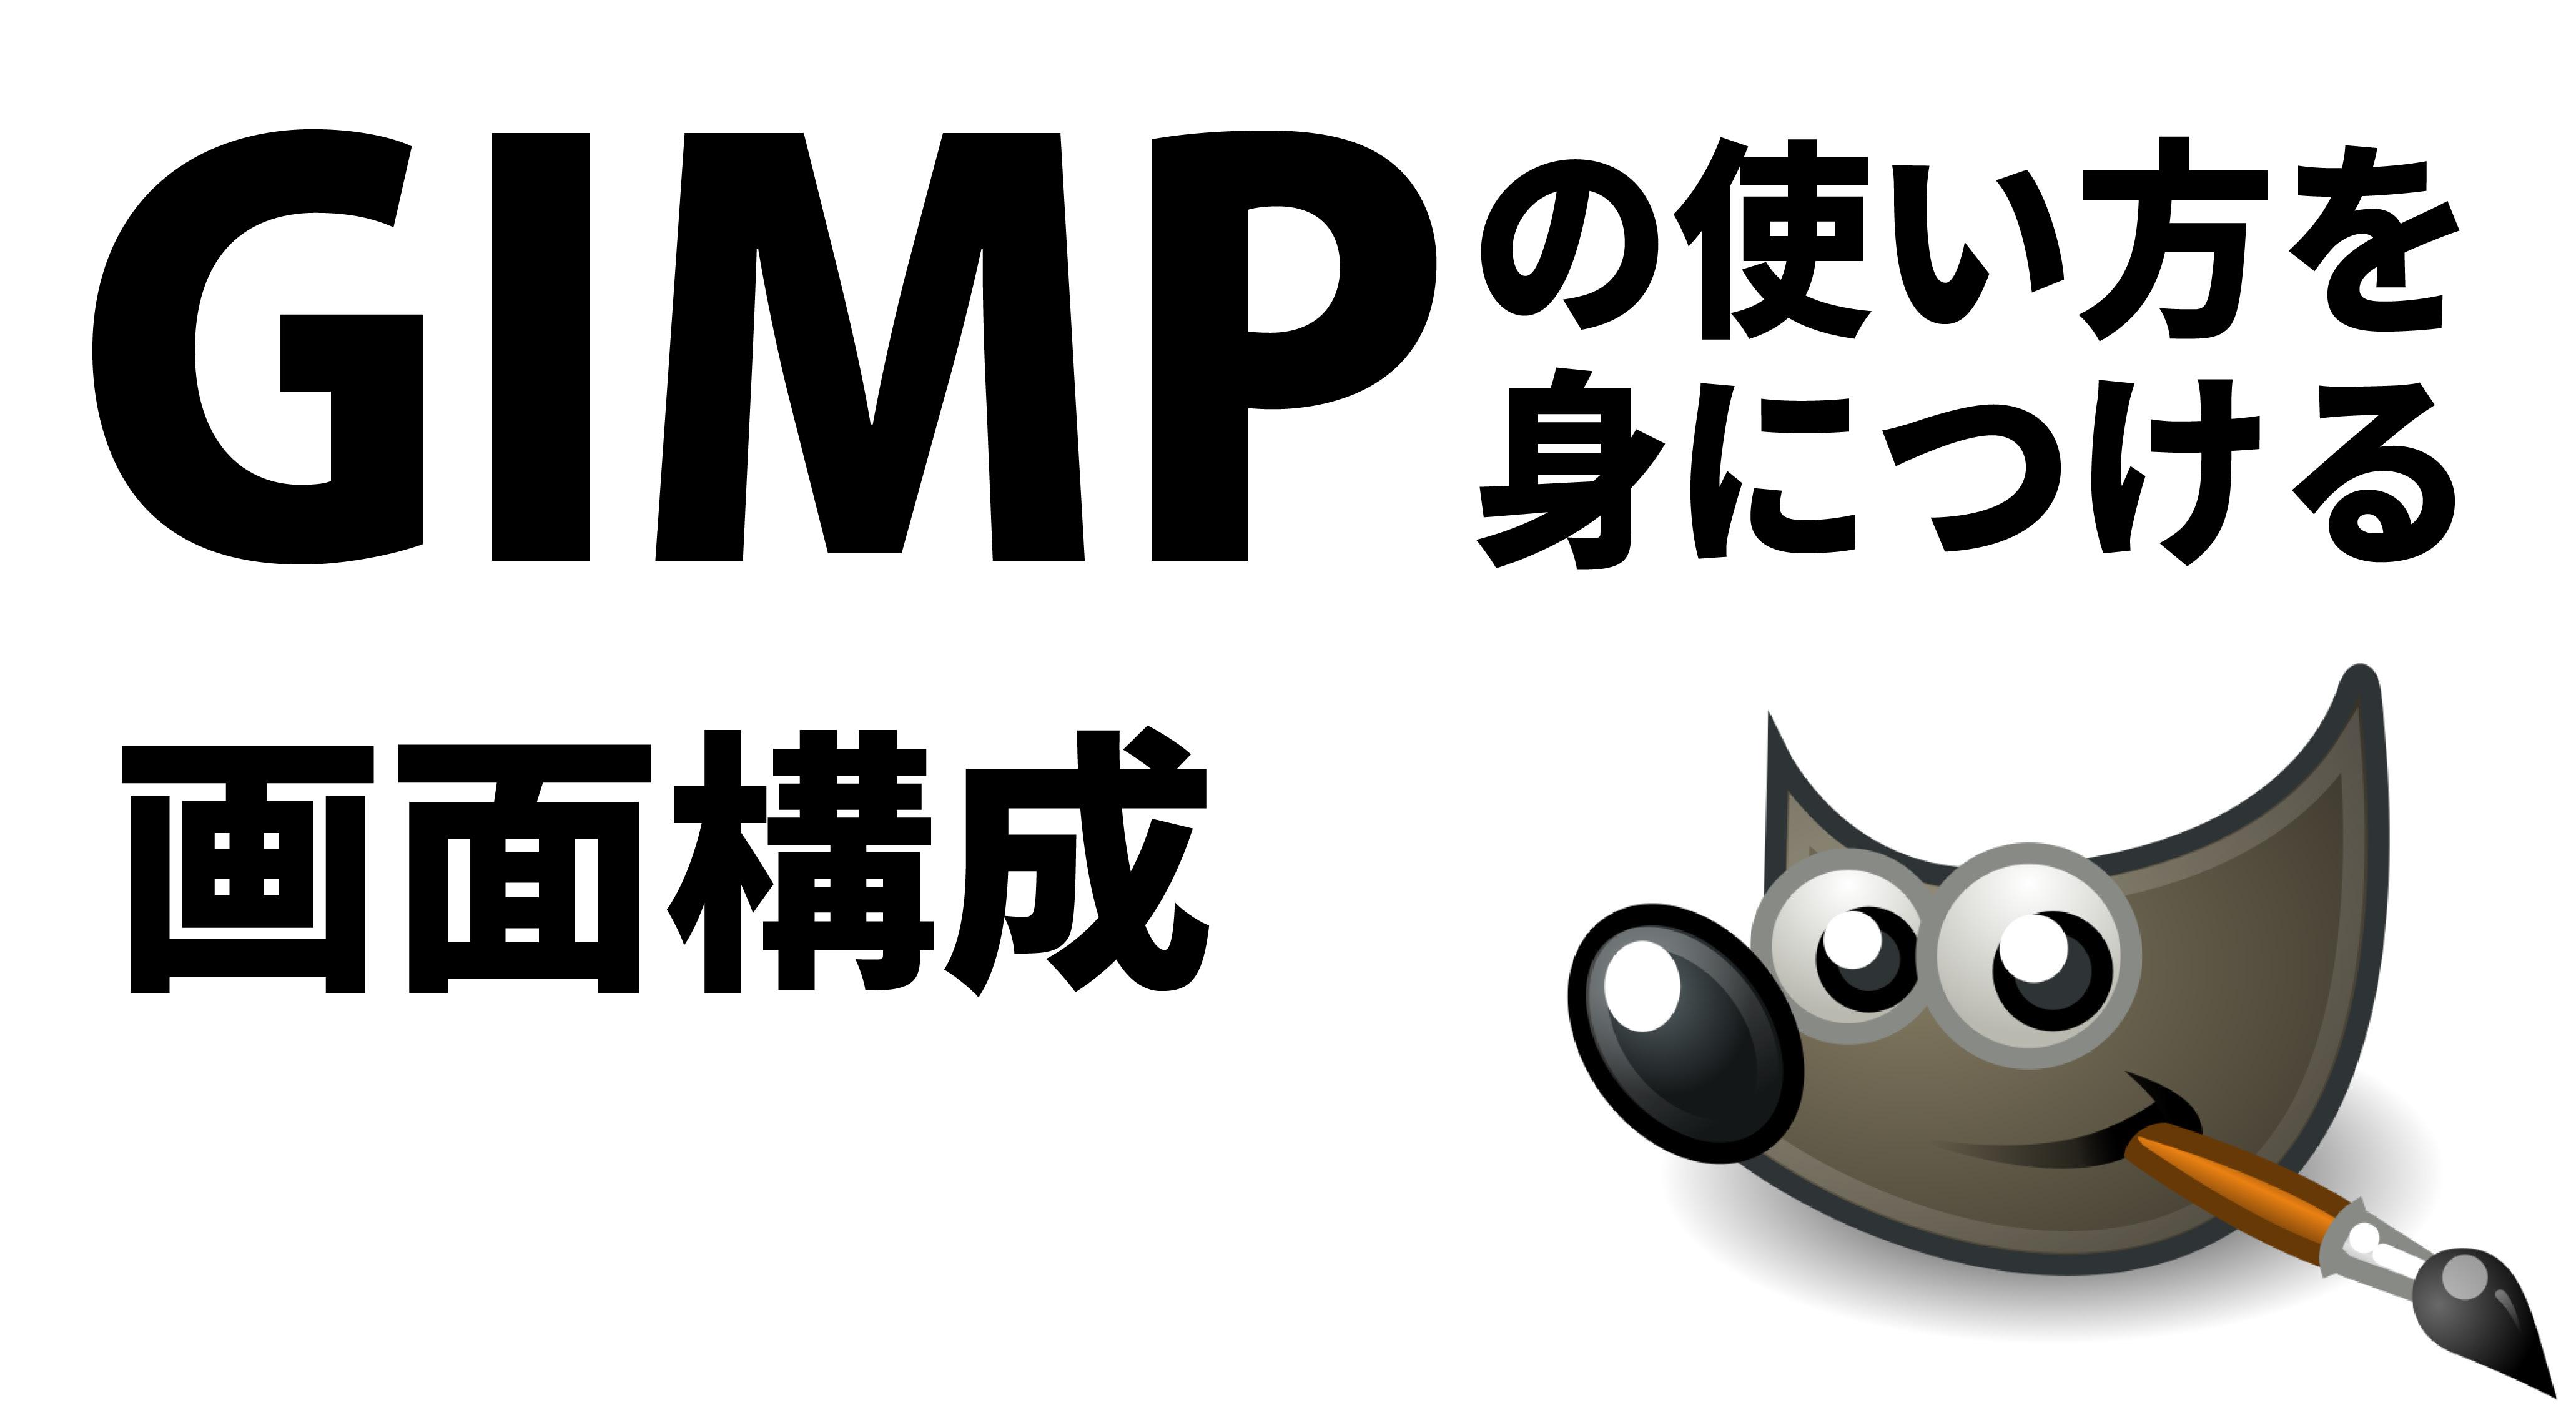 【GIMP入門】使い方を身につける:準備編【画面構成】